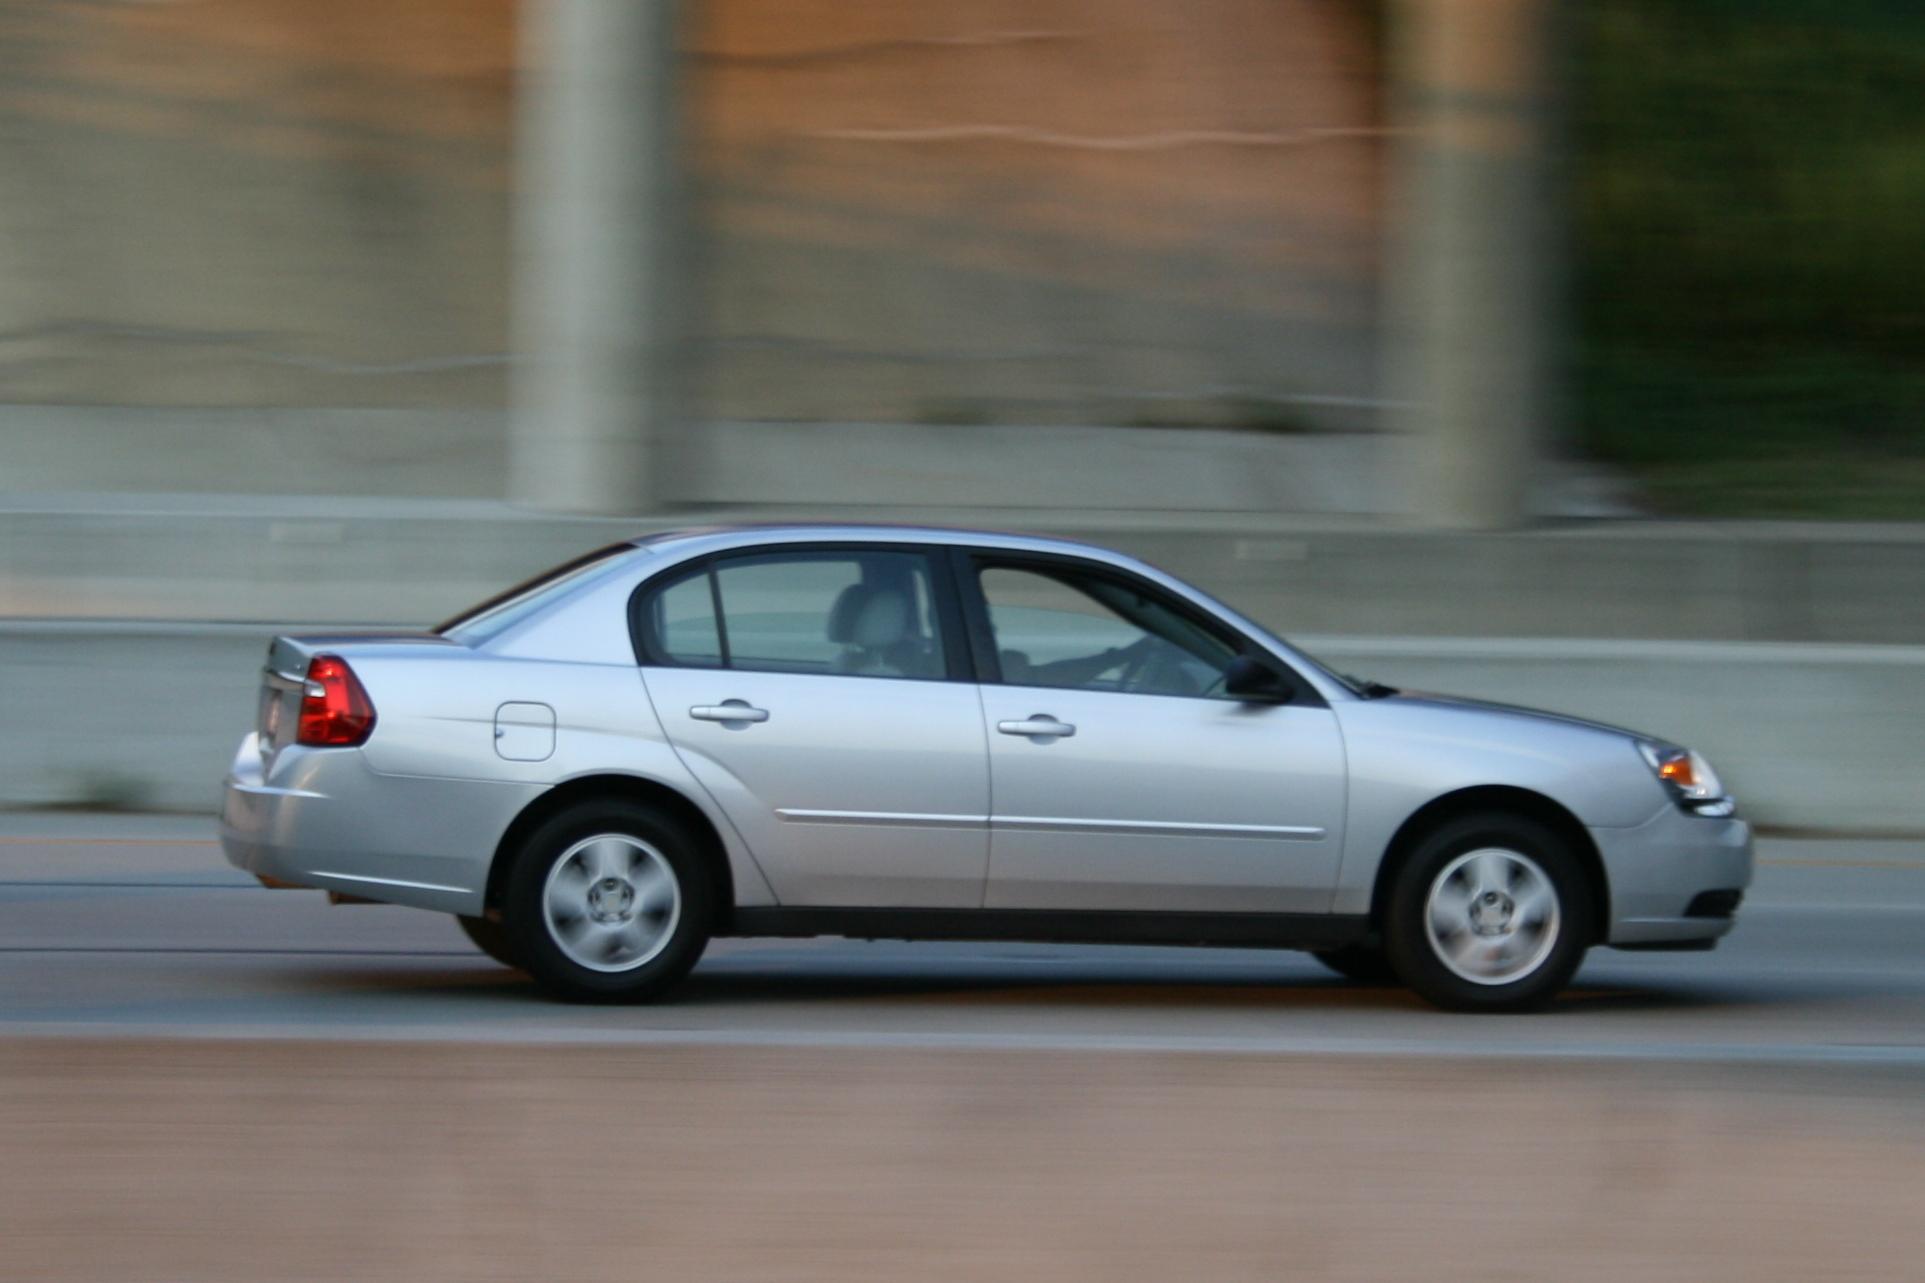 File 2008 07 04 Chevrolet Malibu on I 85 in Durham Wikimedia